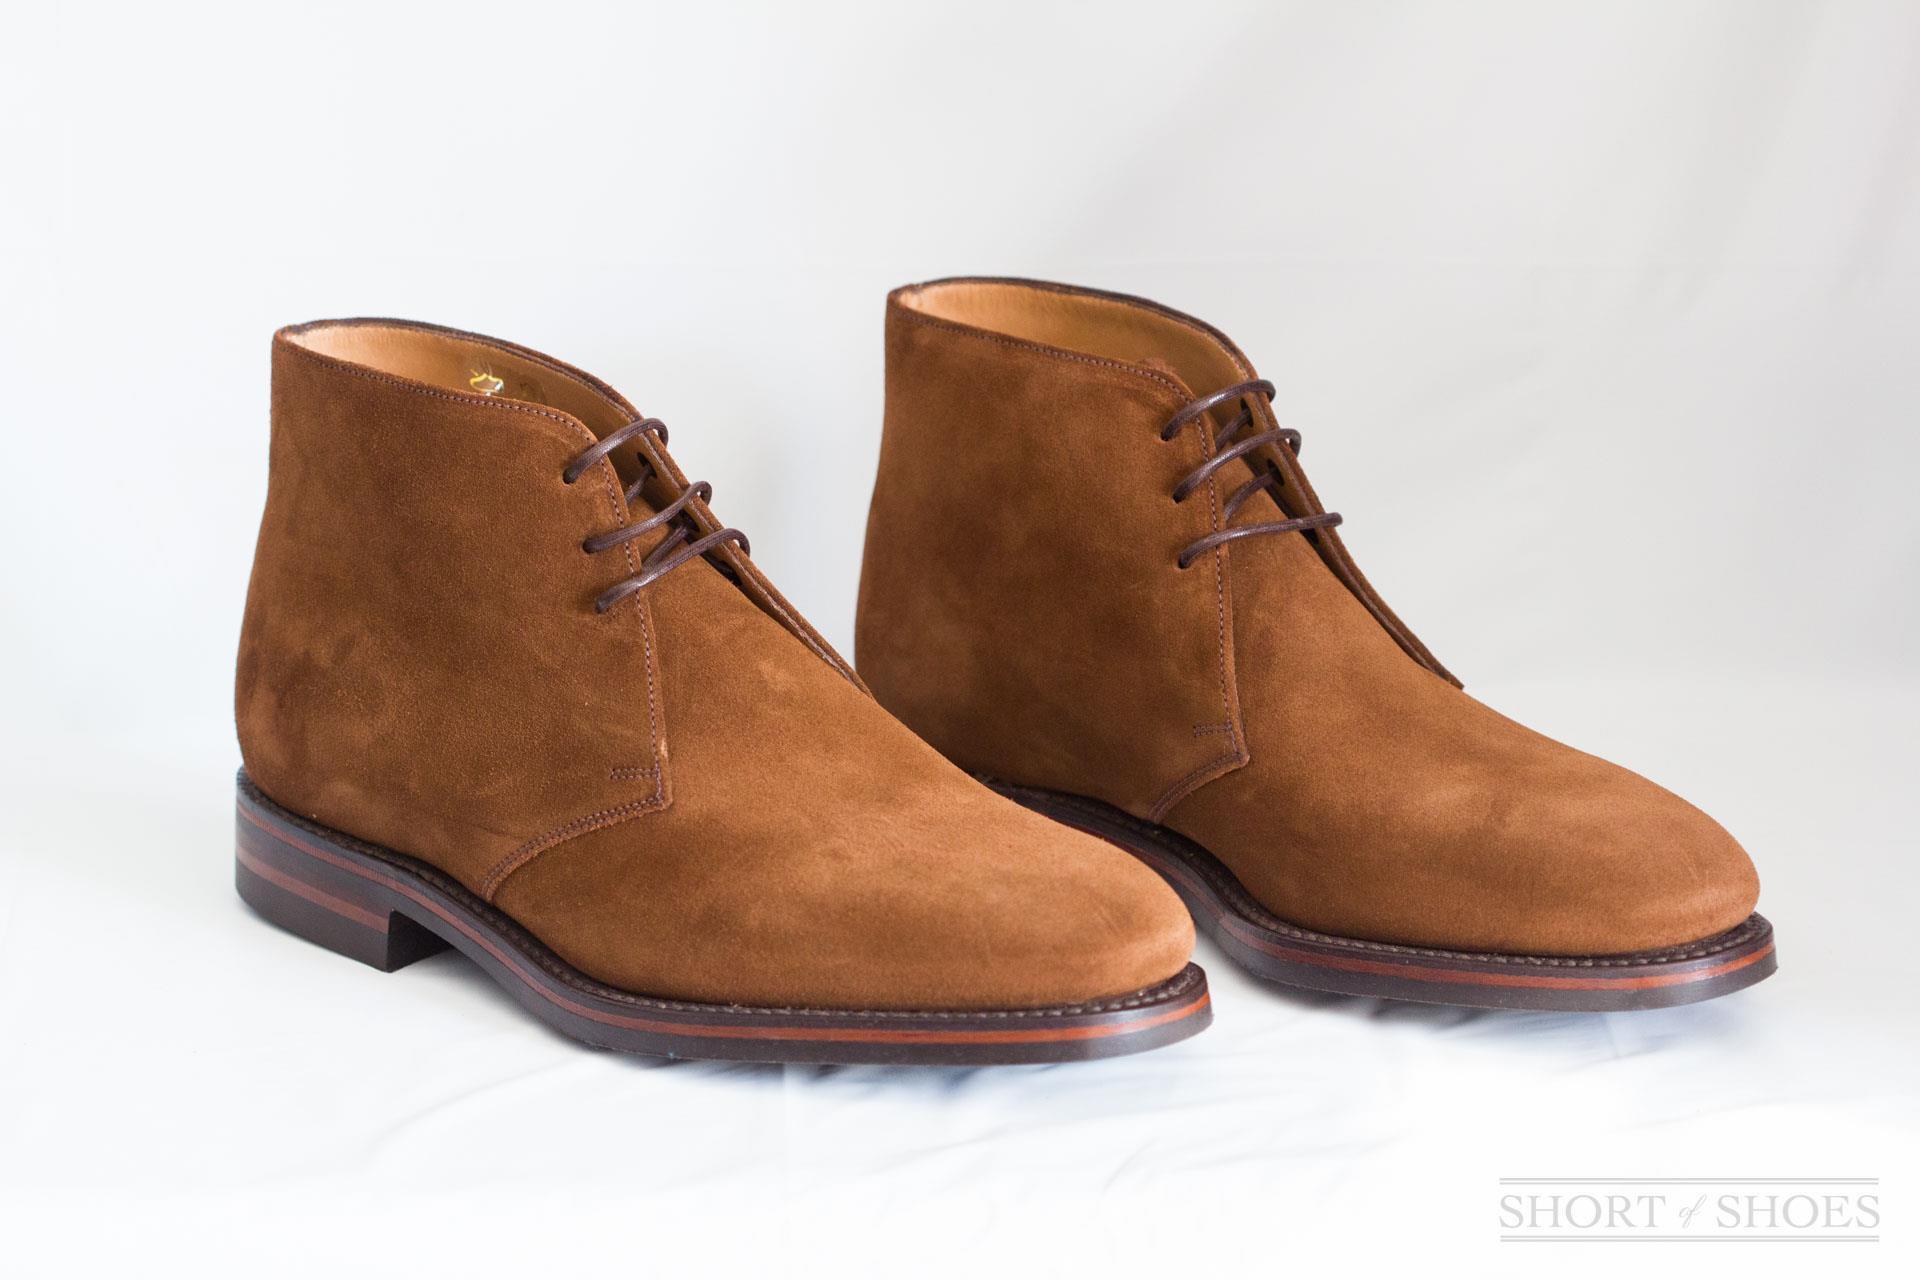 more photos b7861 30ec8 Loake Shoes Review - Kempton Suede Chukka 1880 Line